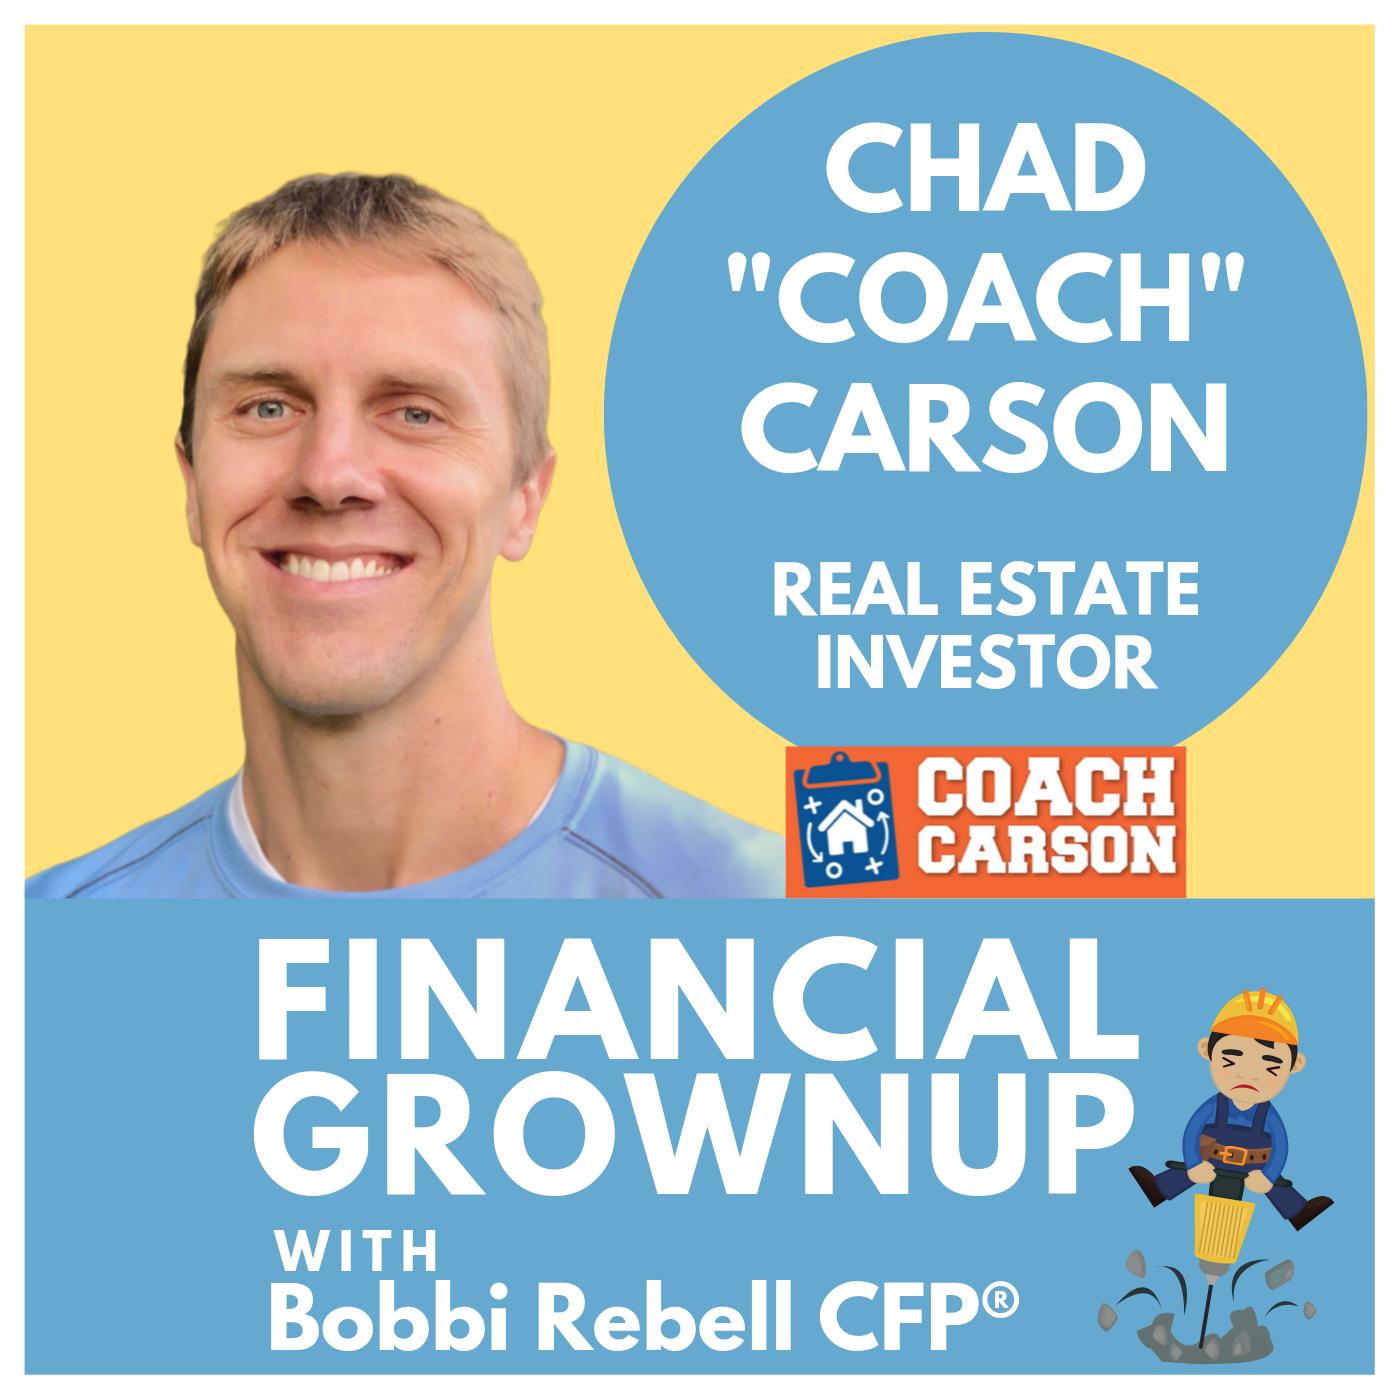 Chad Carson Instagram